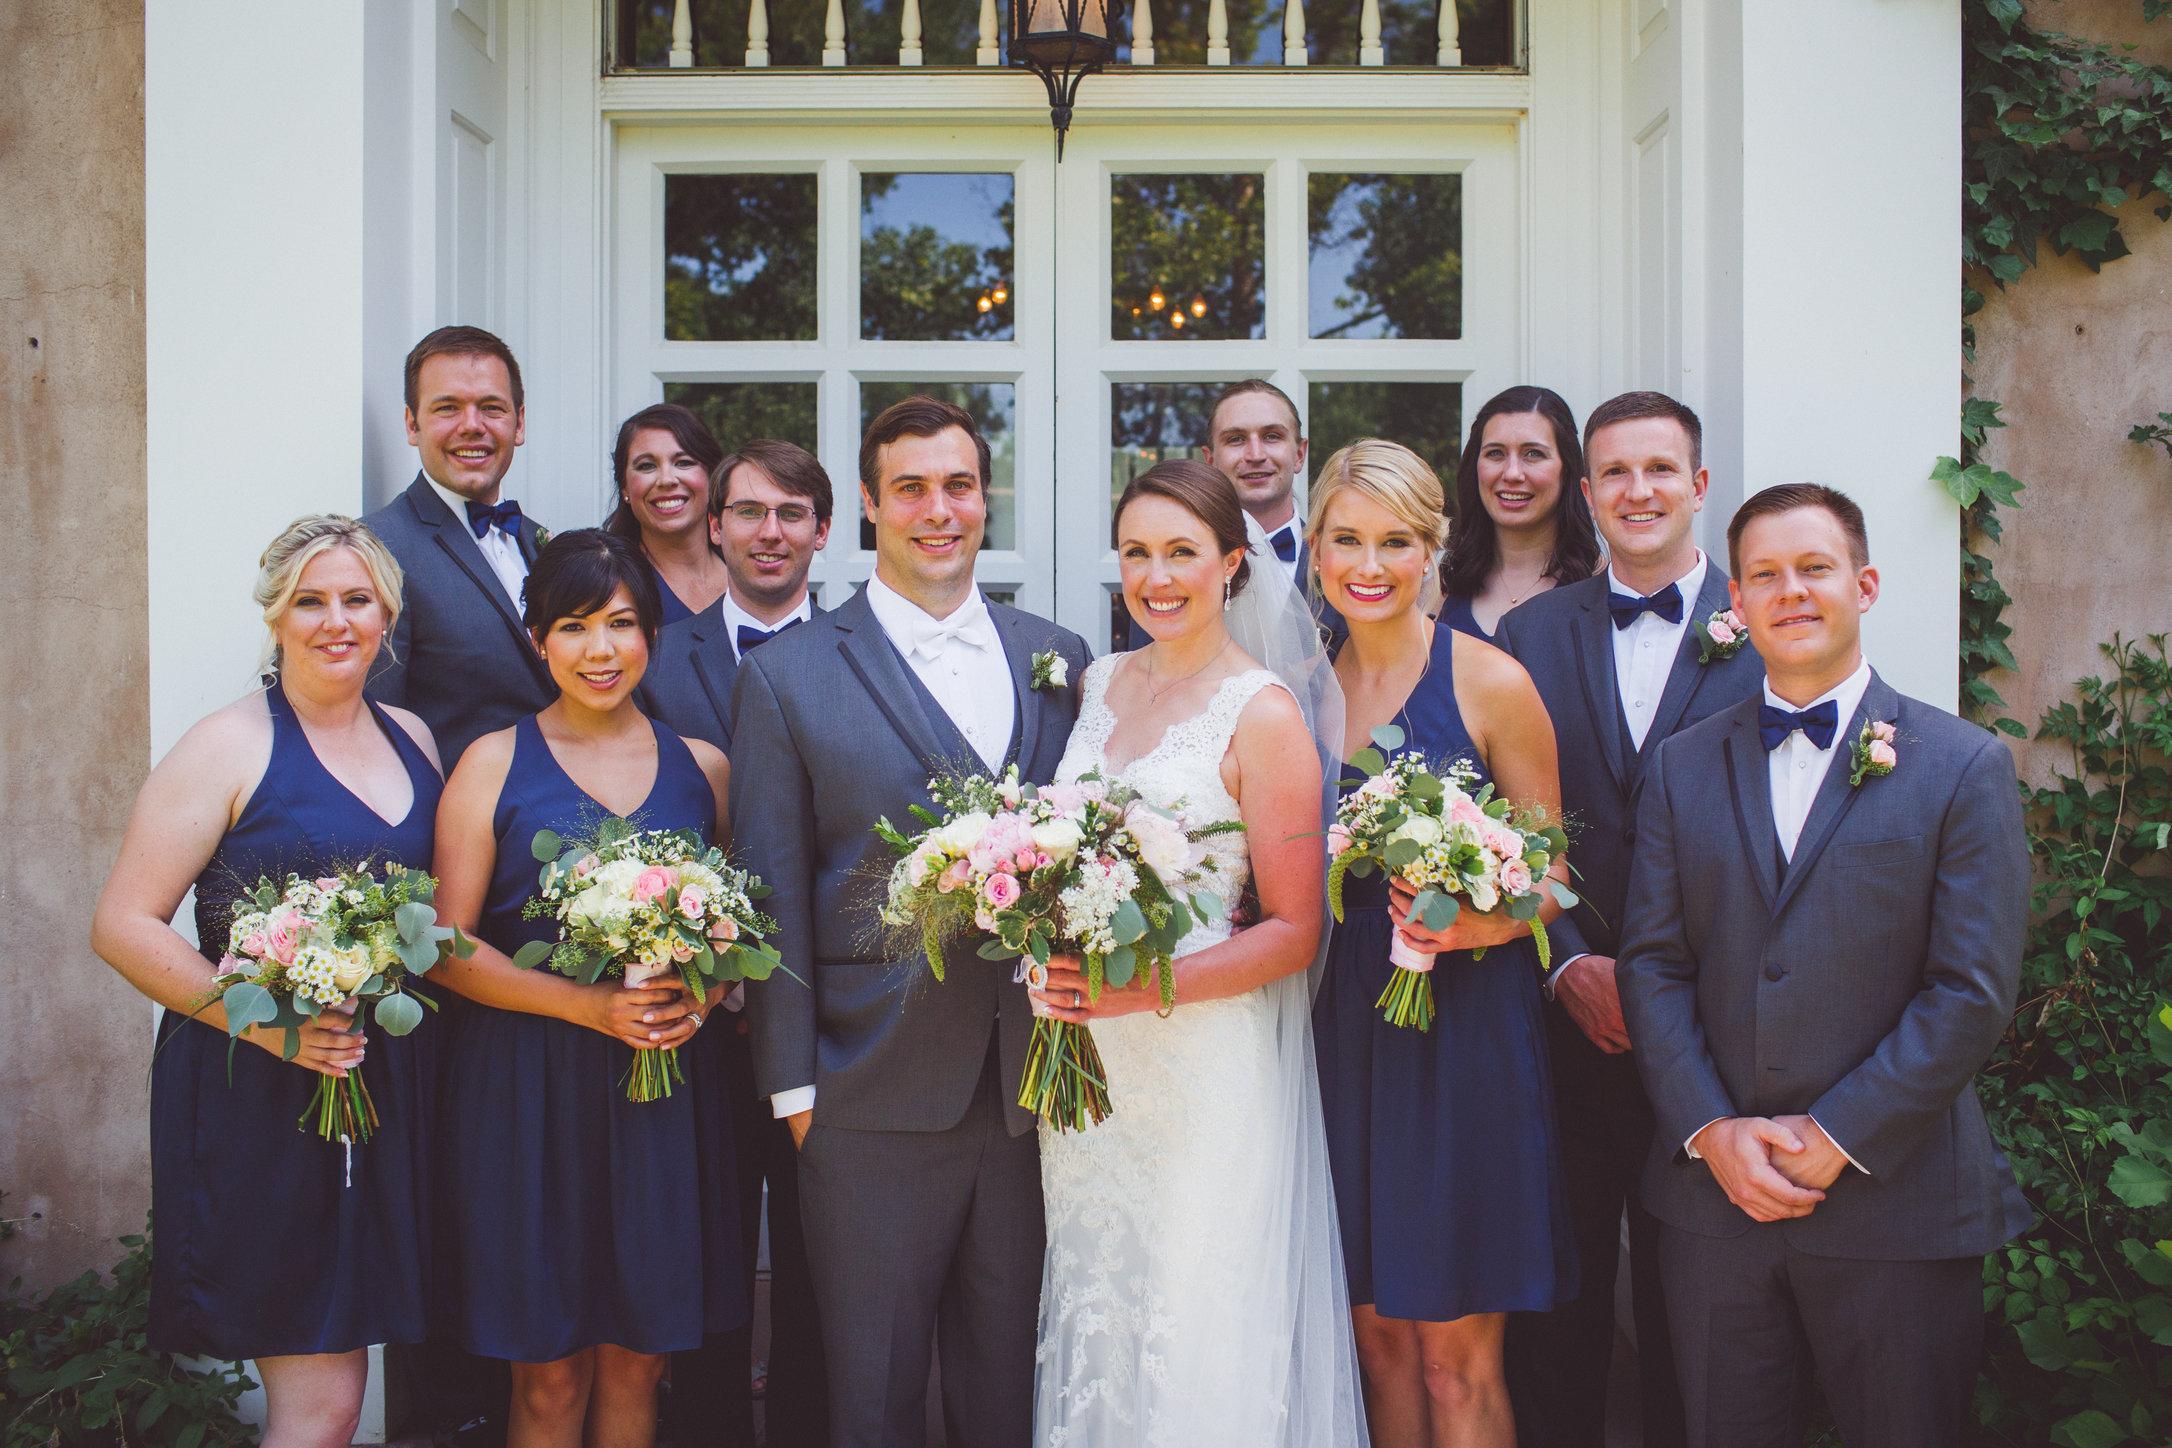 SandC-wedding-344.jpg